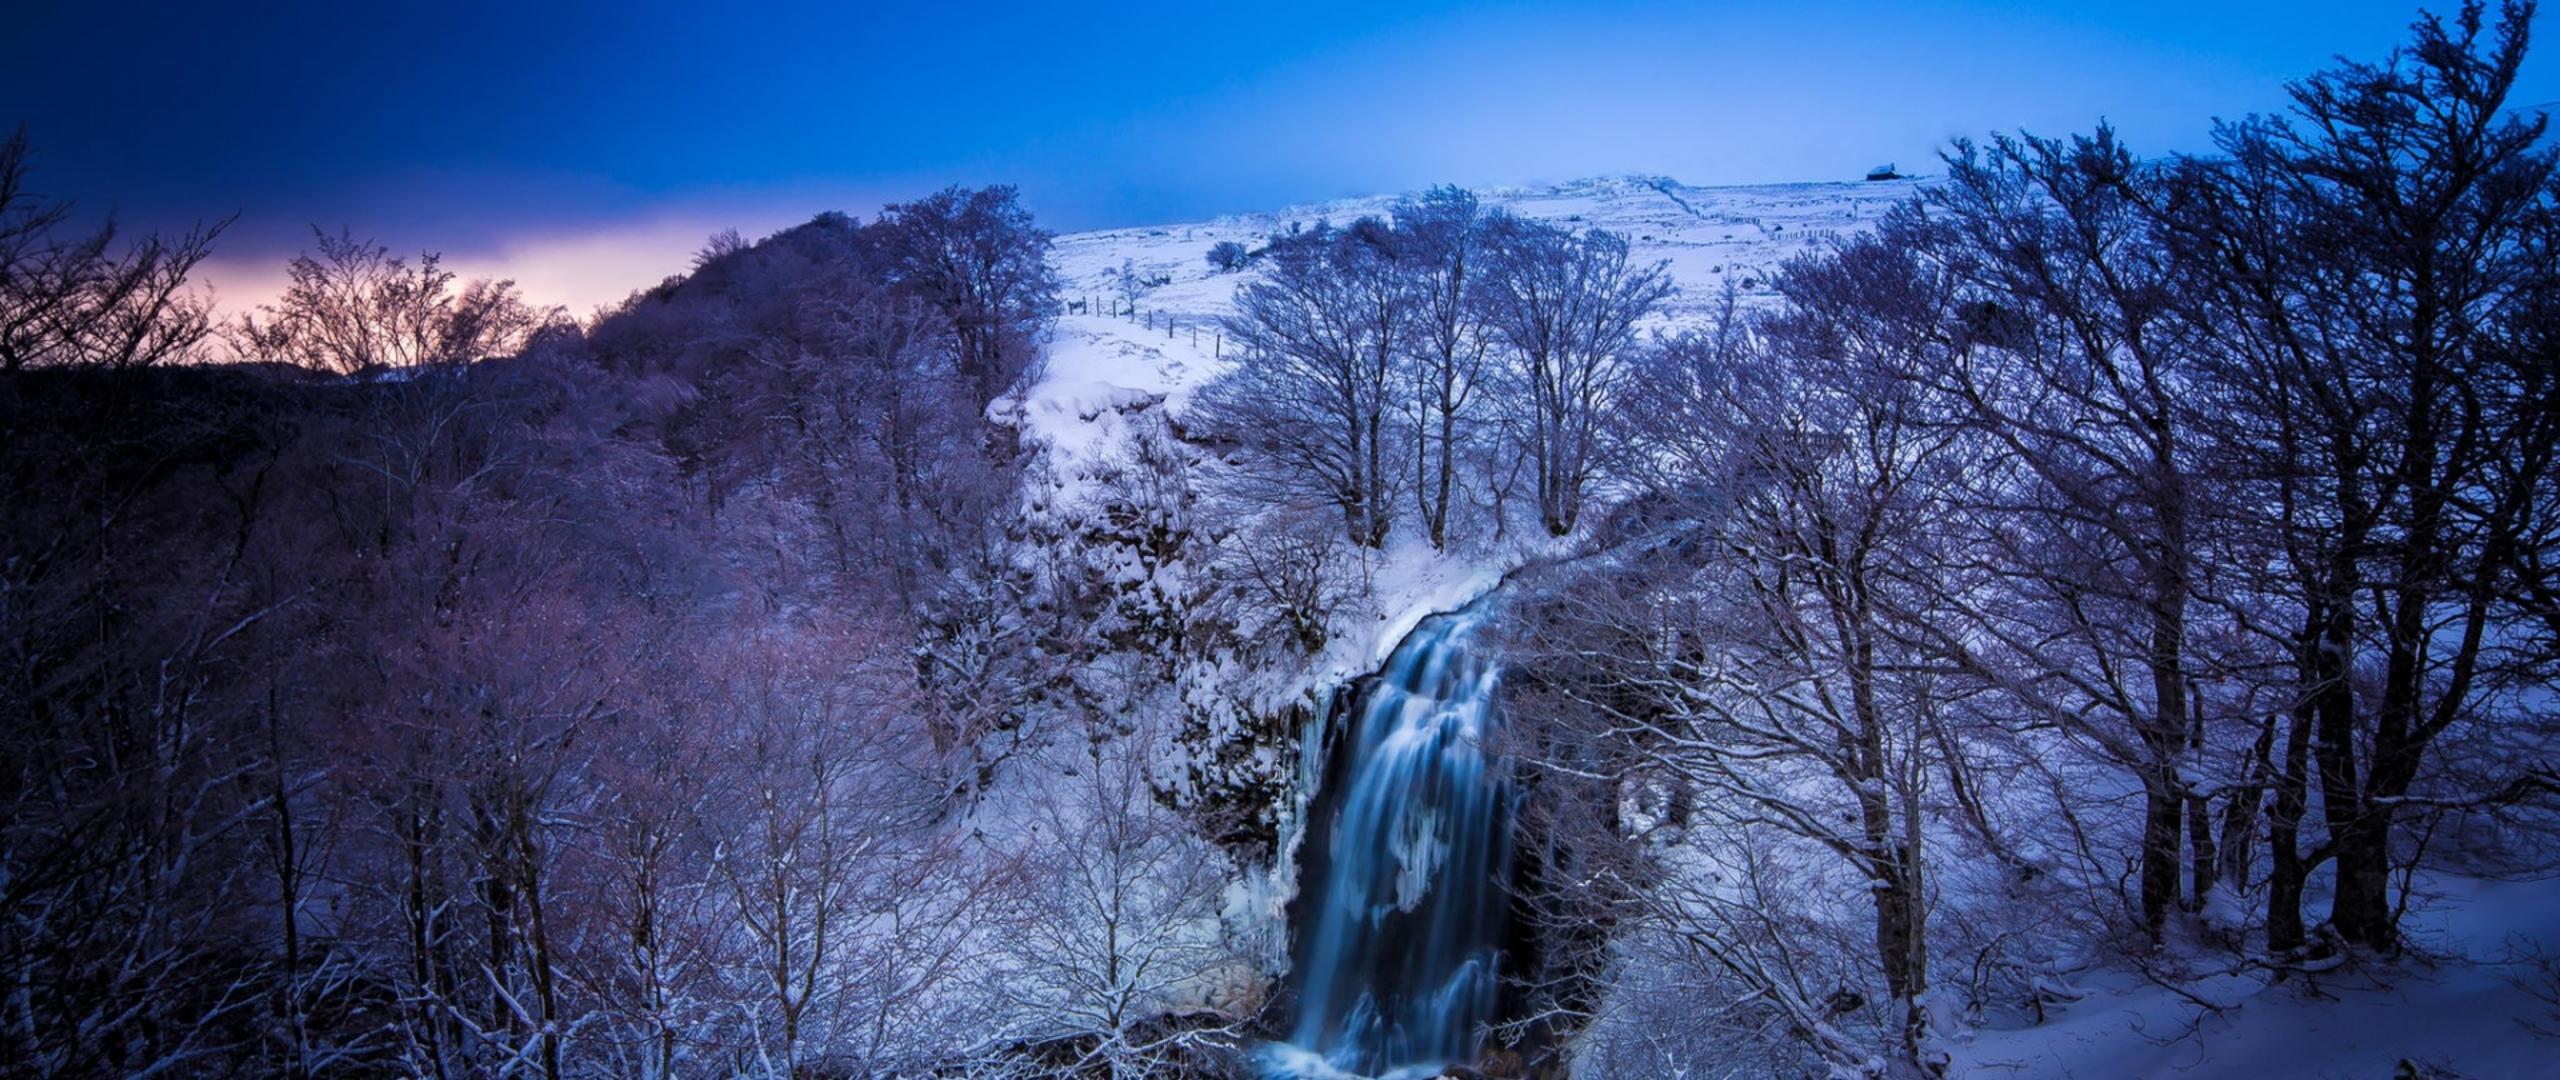 france-winter-hd.jpg